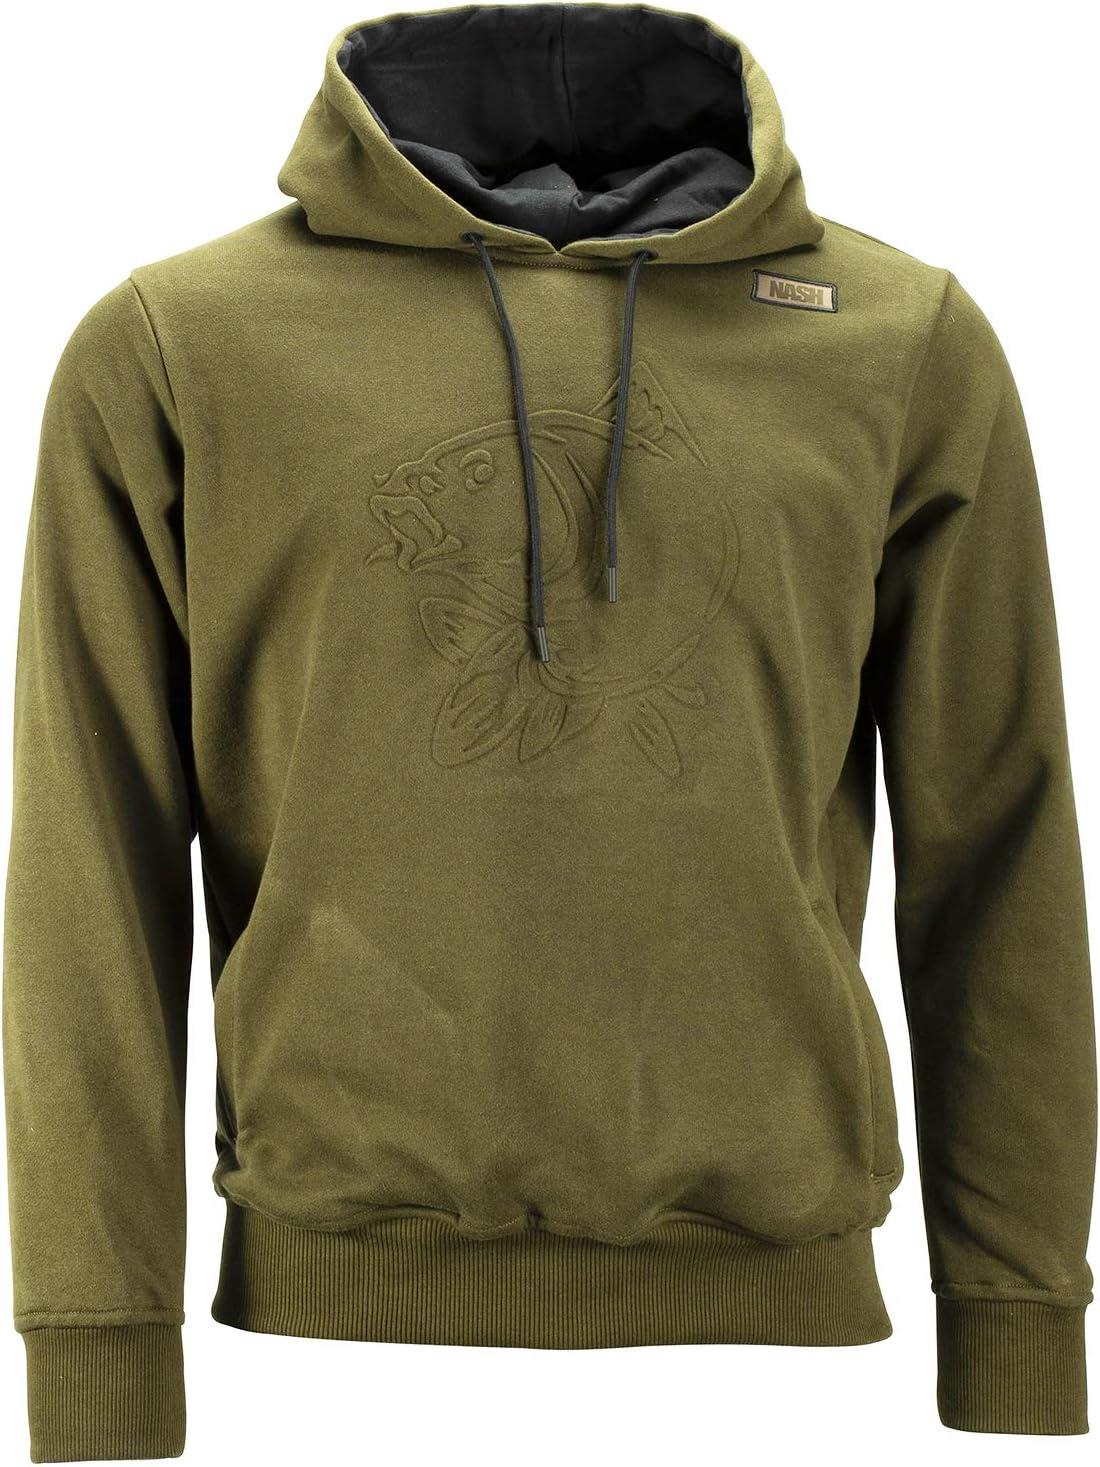 Carp Fishing Clothing Nash Tracksuit Top